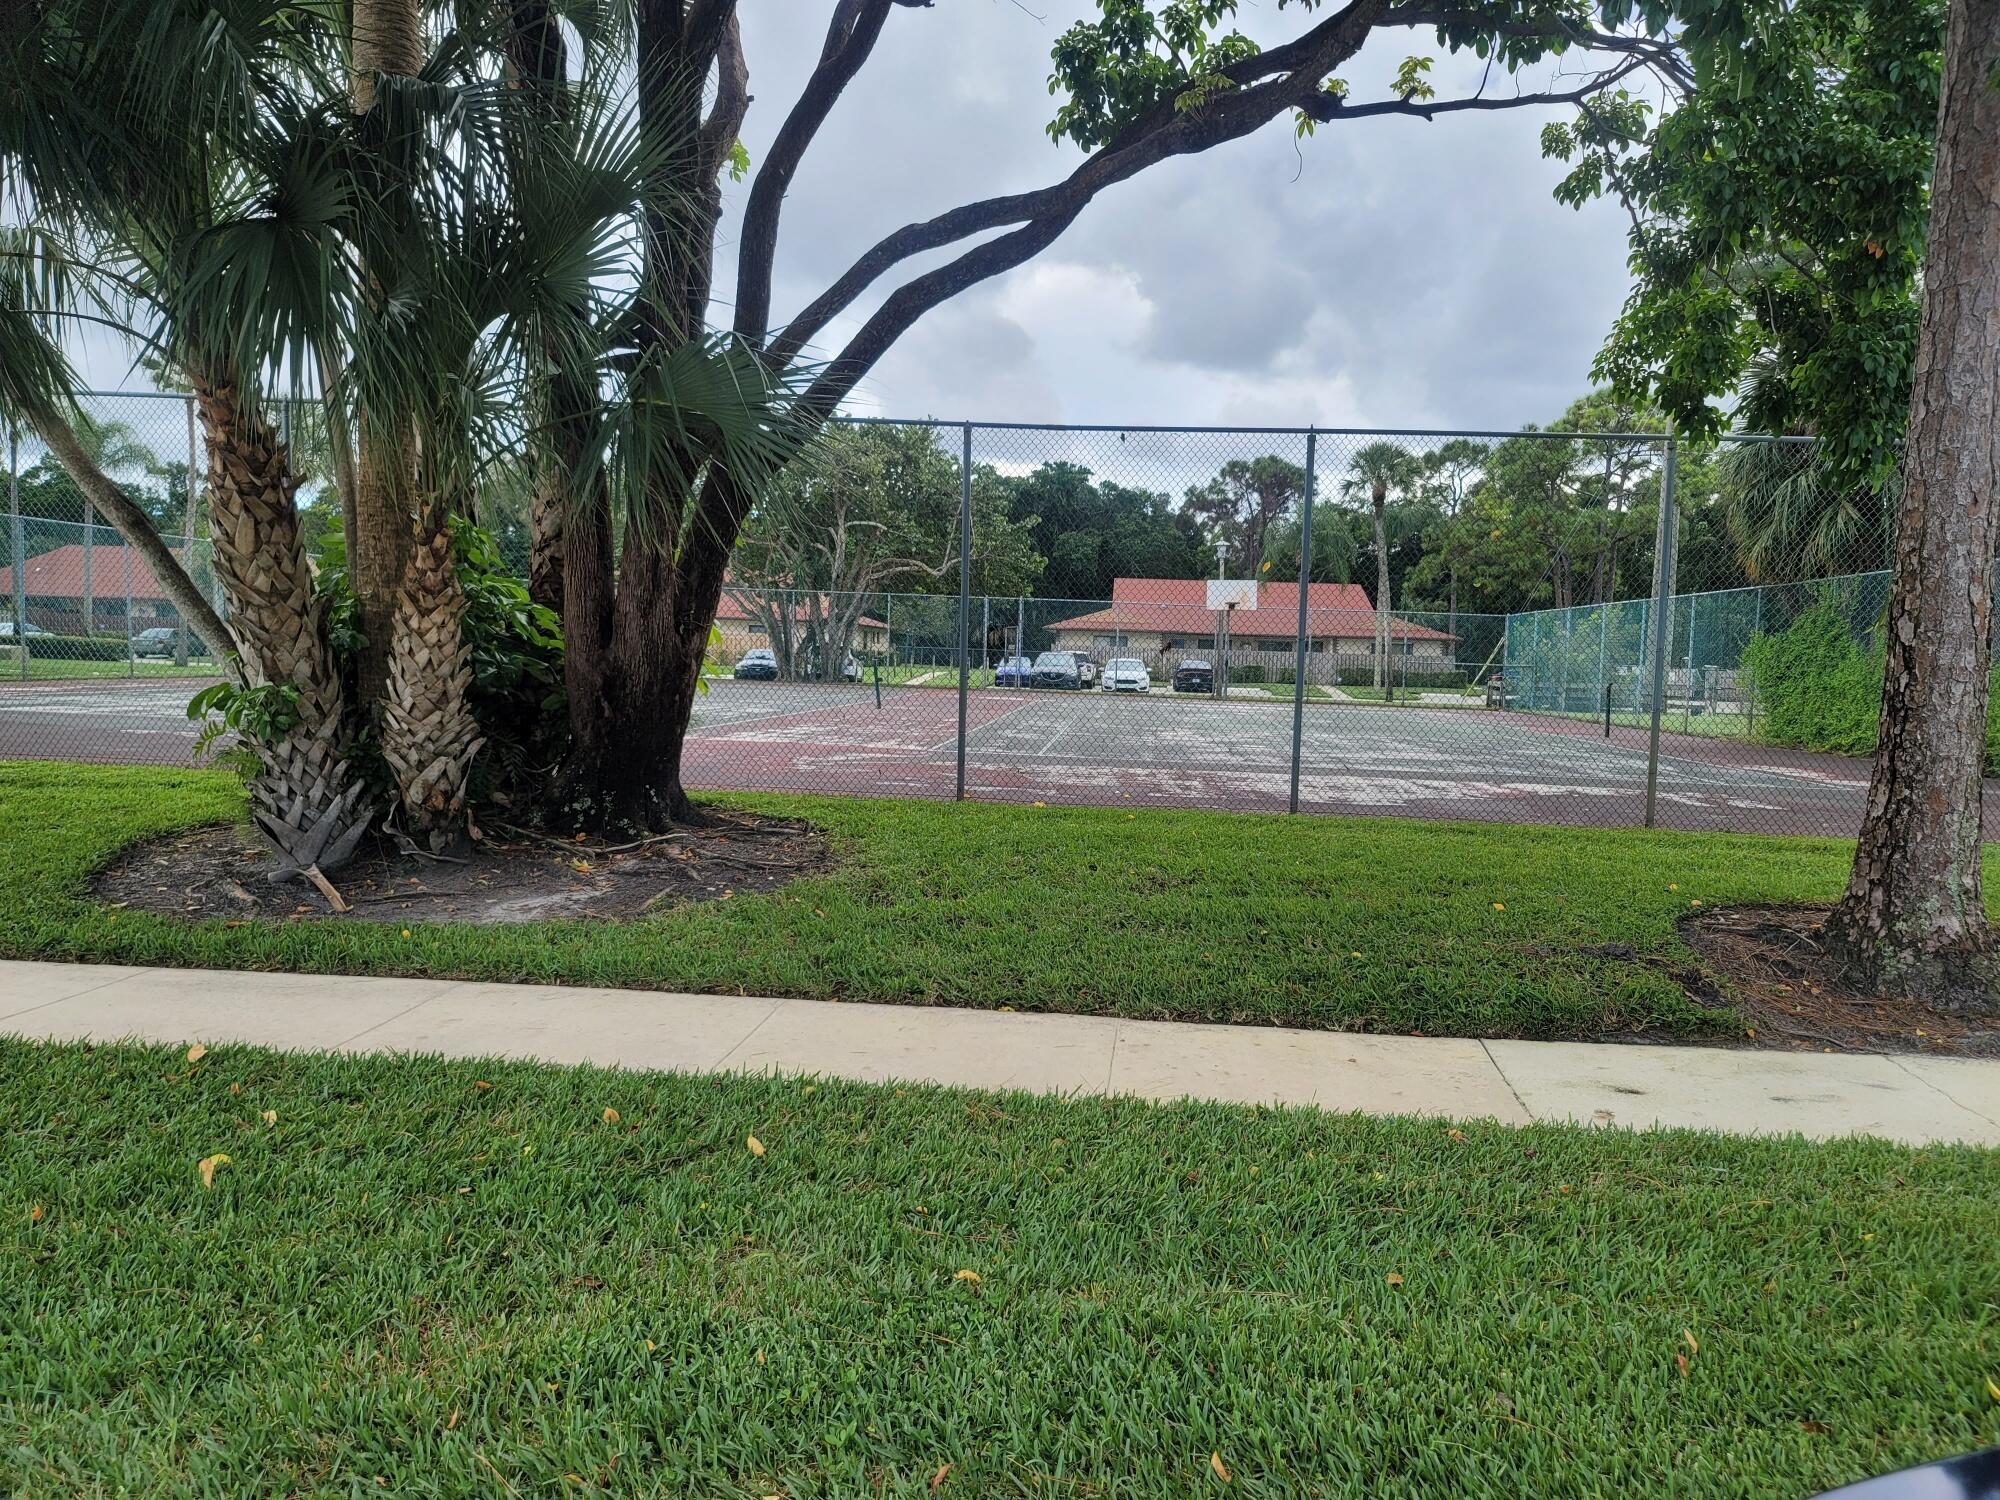 4393 Woodstock Drive #C - 33409 - FL - West Palm Beach